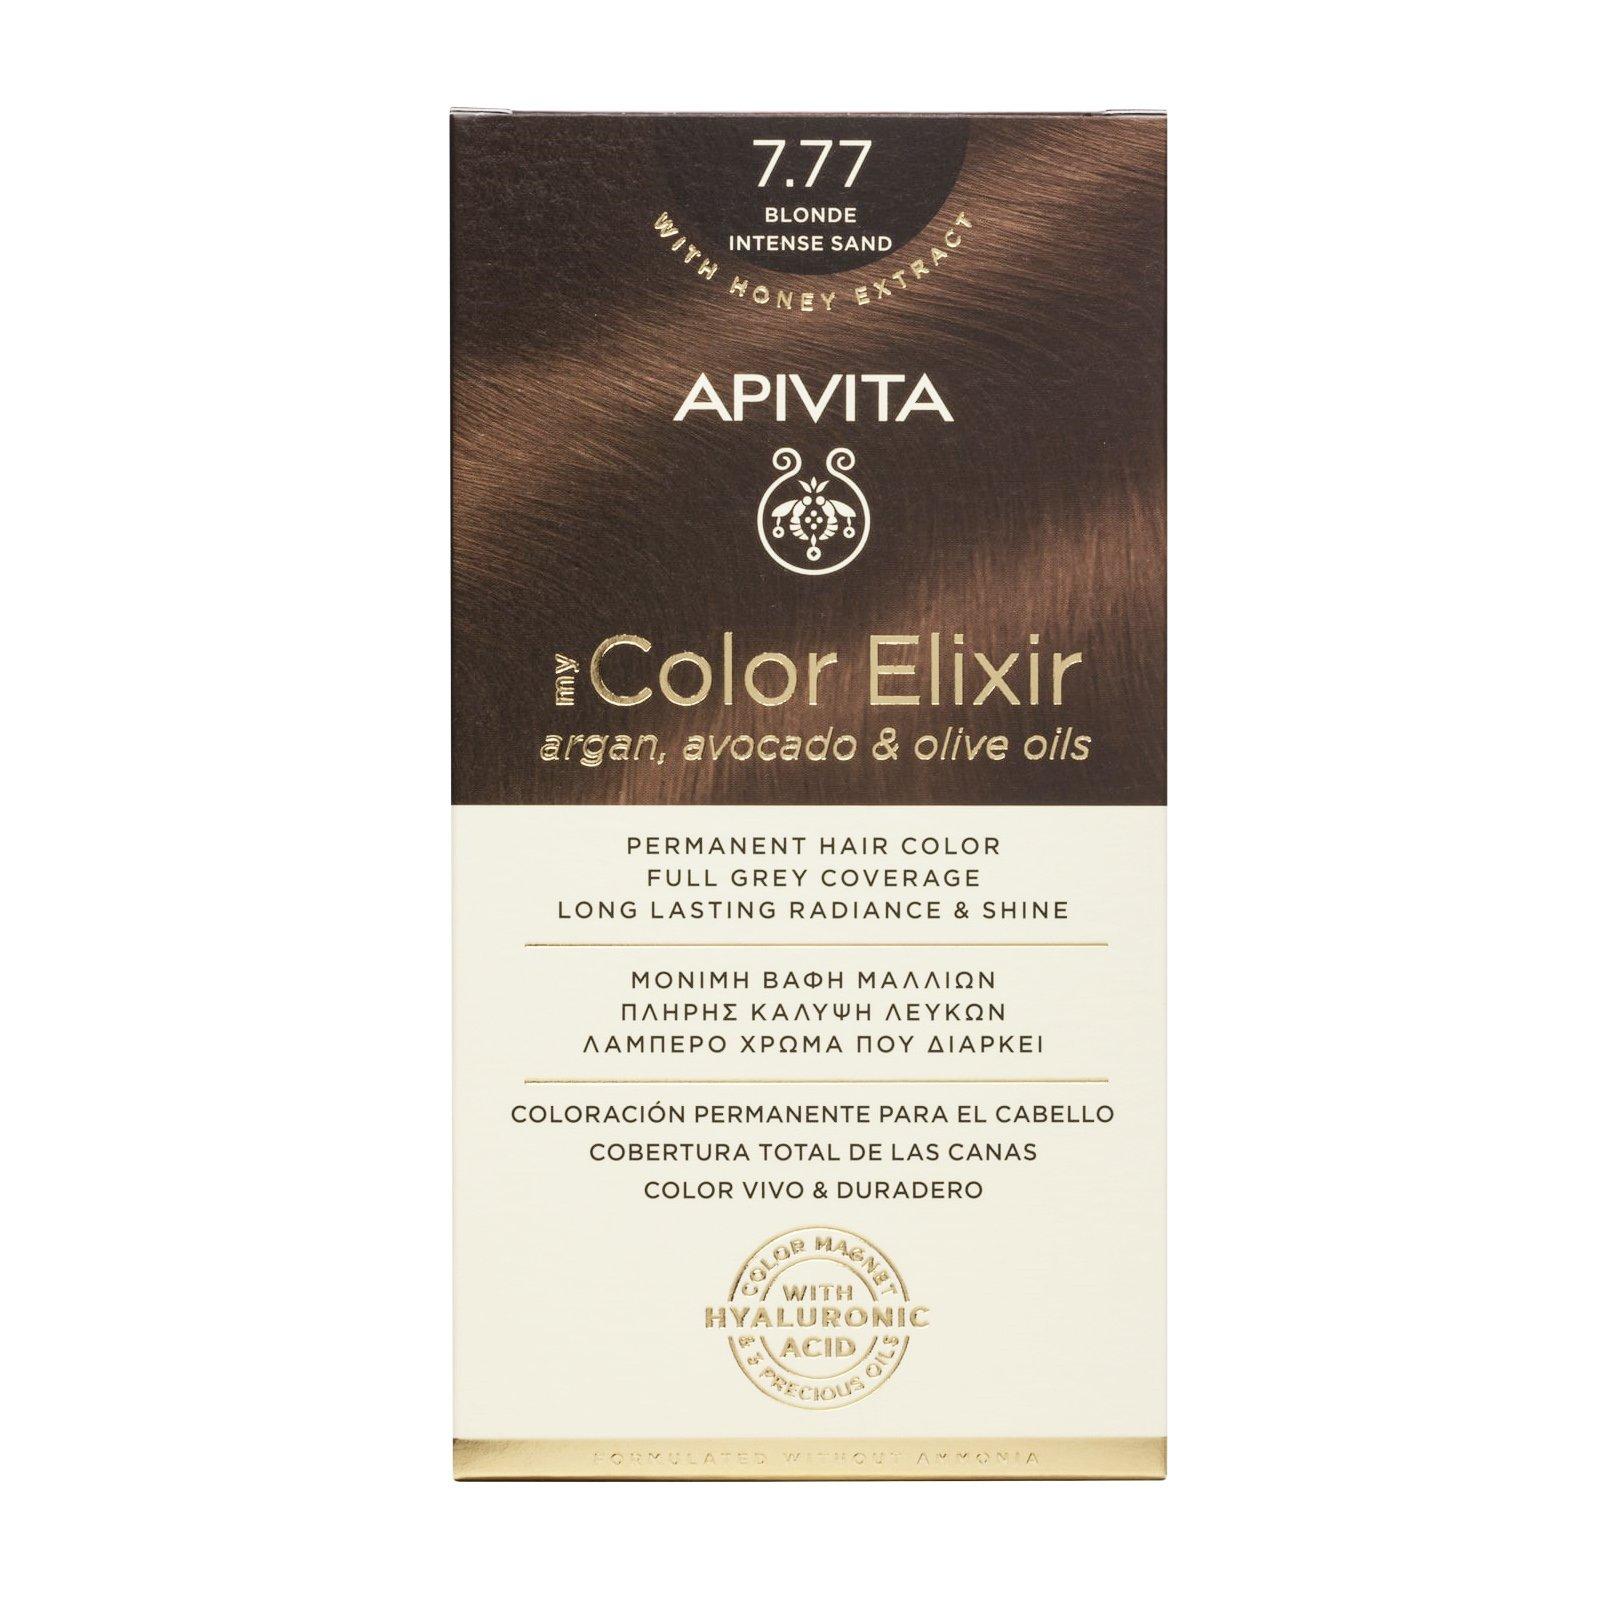 Apivita My Color Elixir Μόνιμη Βαφή Μαλλιών με Καινοτόμο Σύστημα Color Magnet που Σταθεροποιεί και Σφραγίζει το Χρώμα στην Τρίχα – N 7.77 ΞΑΝΘΟ ΕΝΤΟΝΟ ΜΠΕΖ